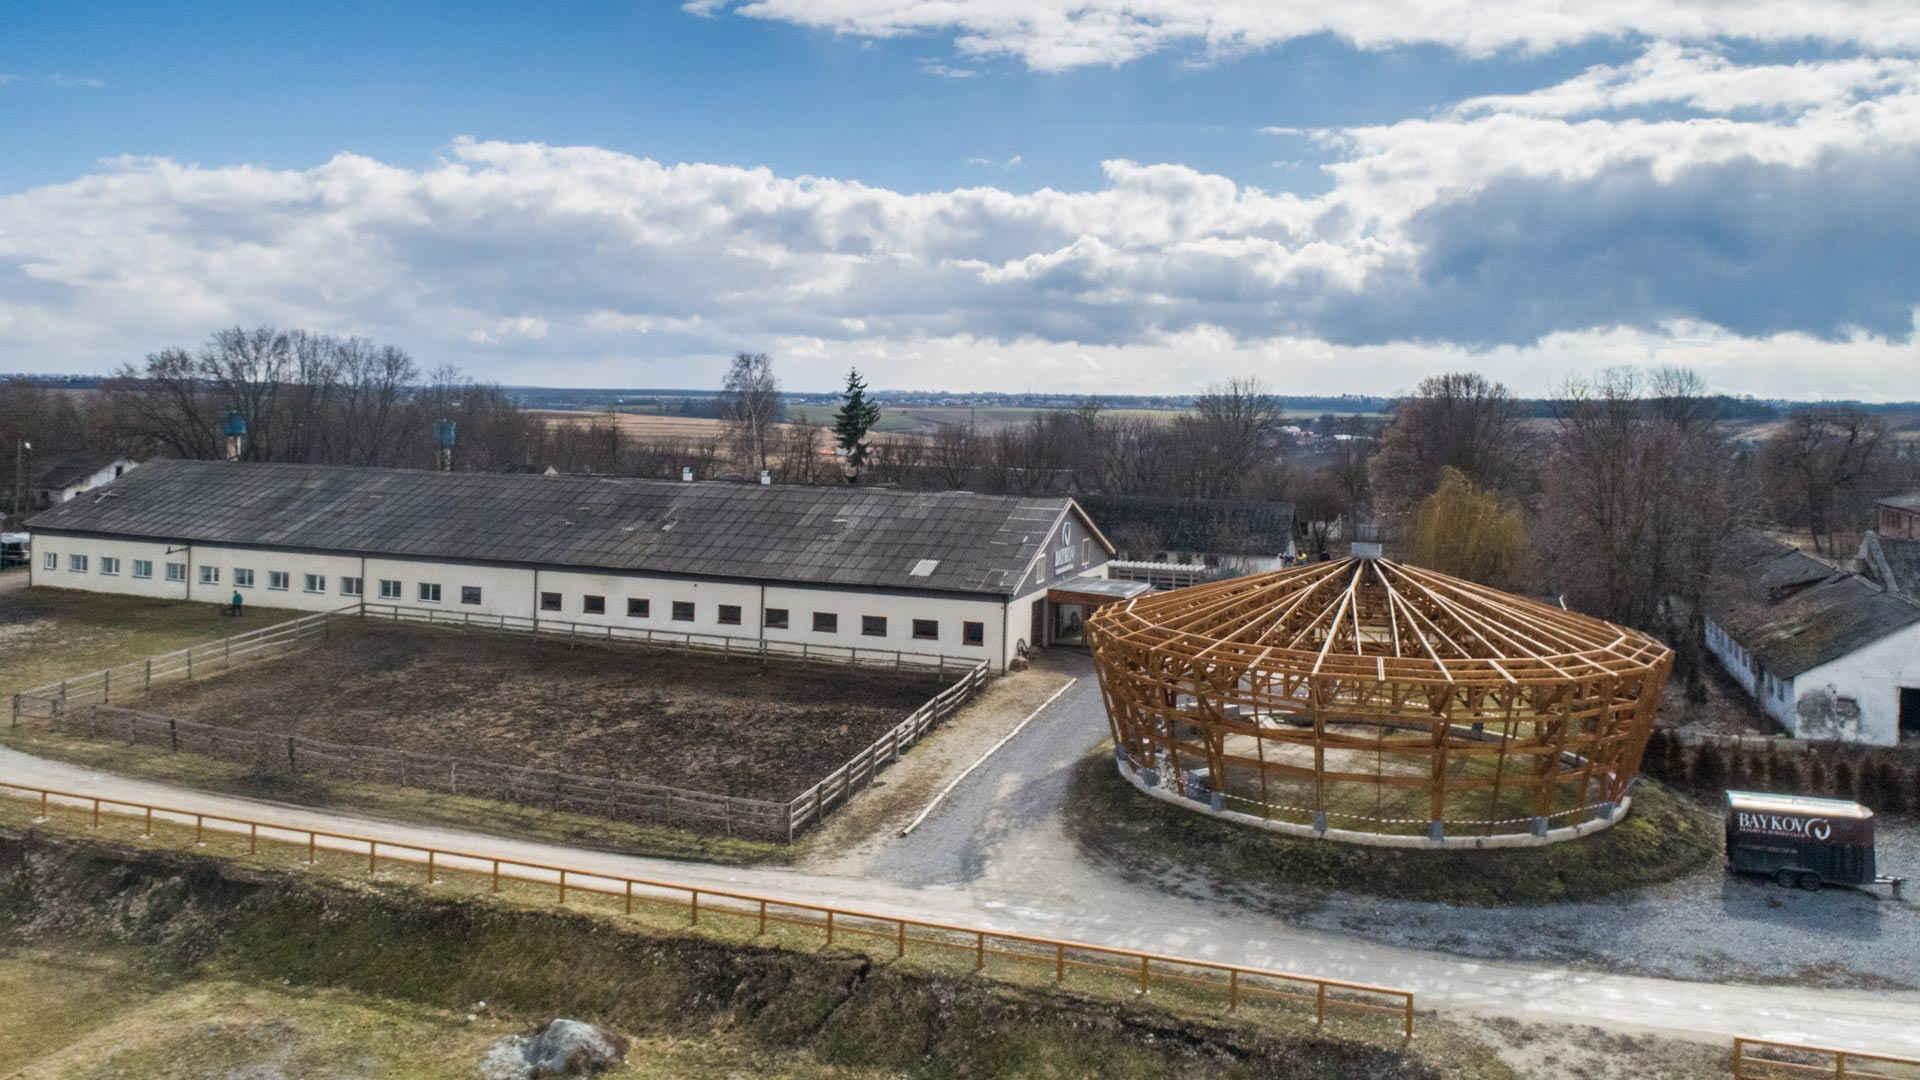 Baikovetska hromada: big enterprise and an observatory